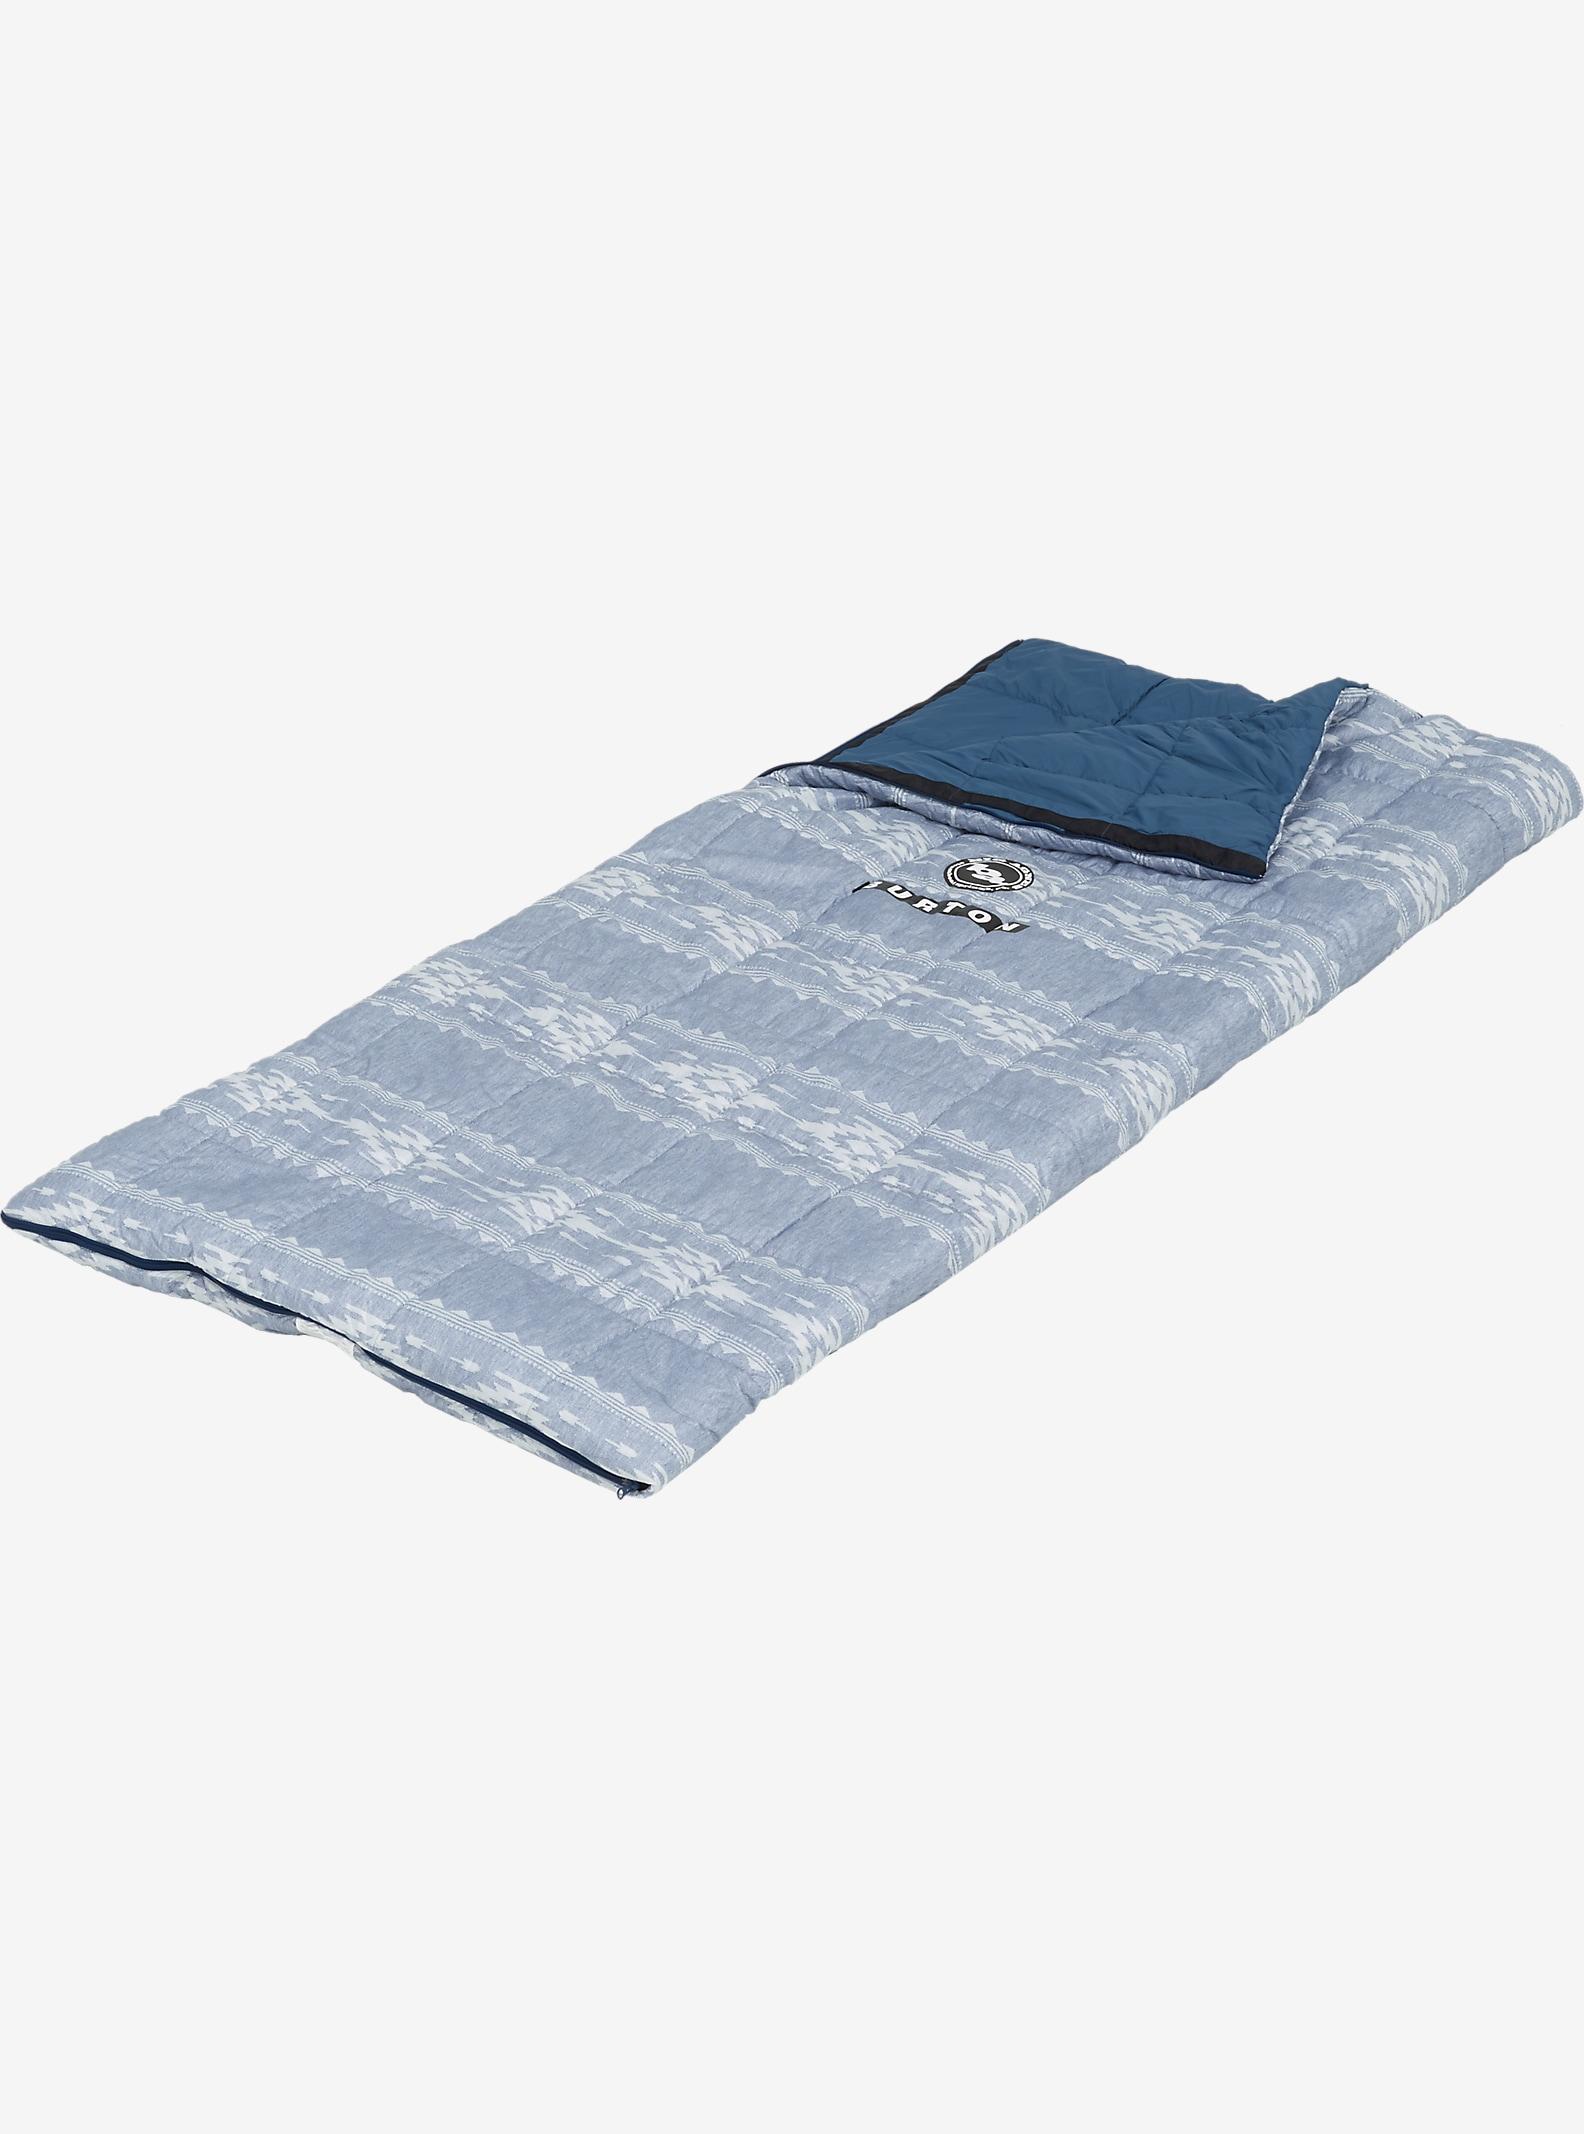 The Big Agnes x Burton Dirt Bag shown in Famish Stripe